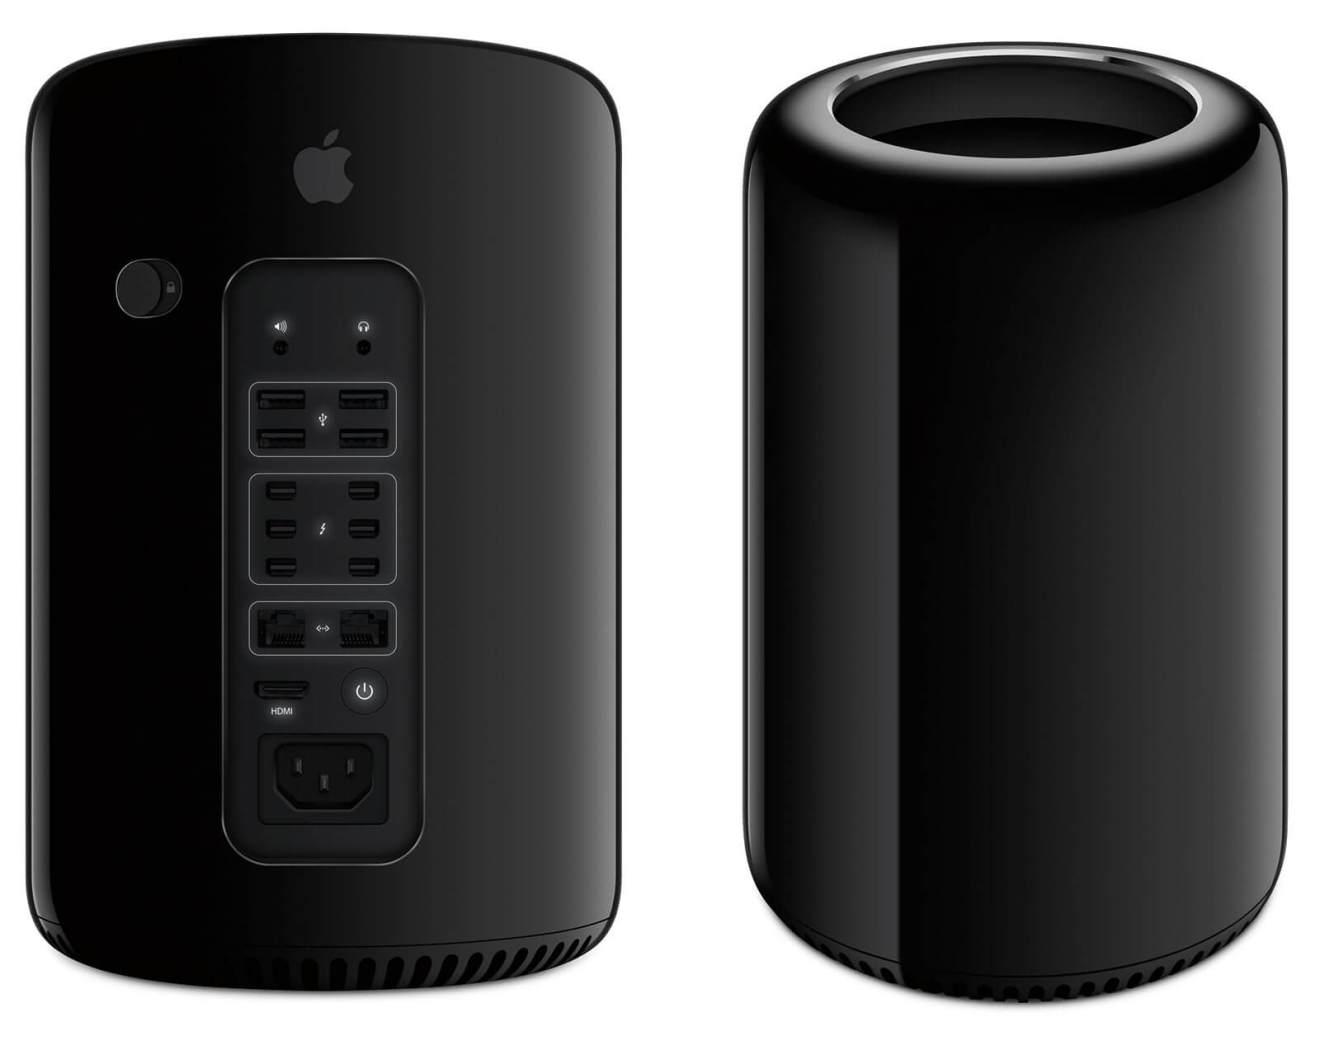 Mac Pro 1 - Apple atualizará o Mac Pro após 4 longos anos